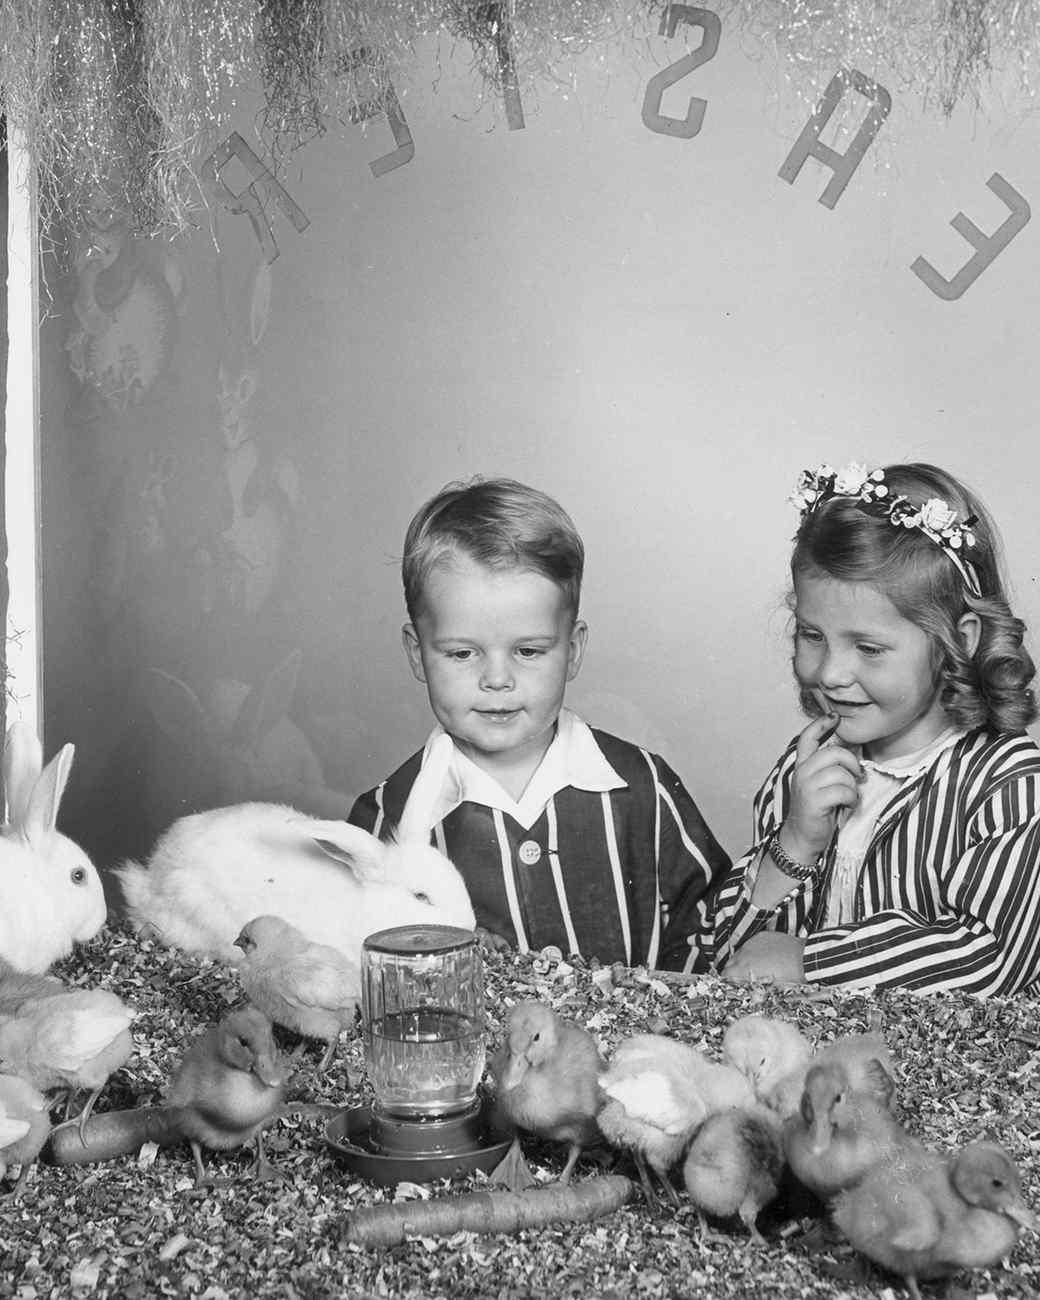 young boy and girl looking at baby chicks and rabbits